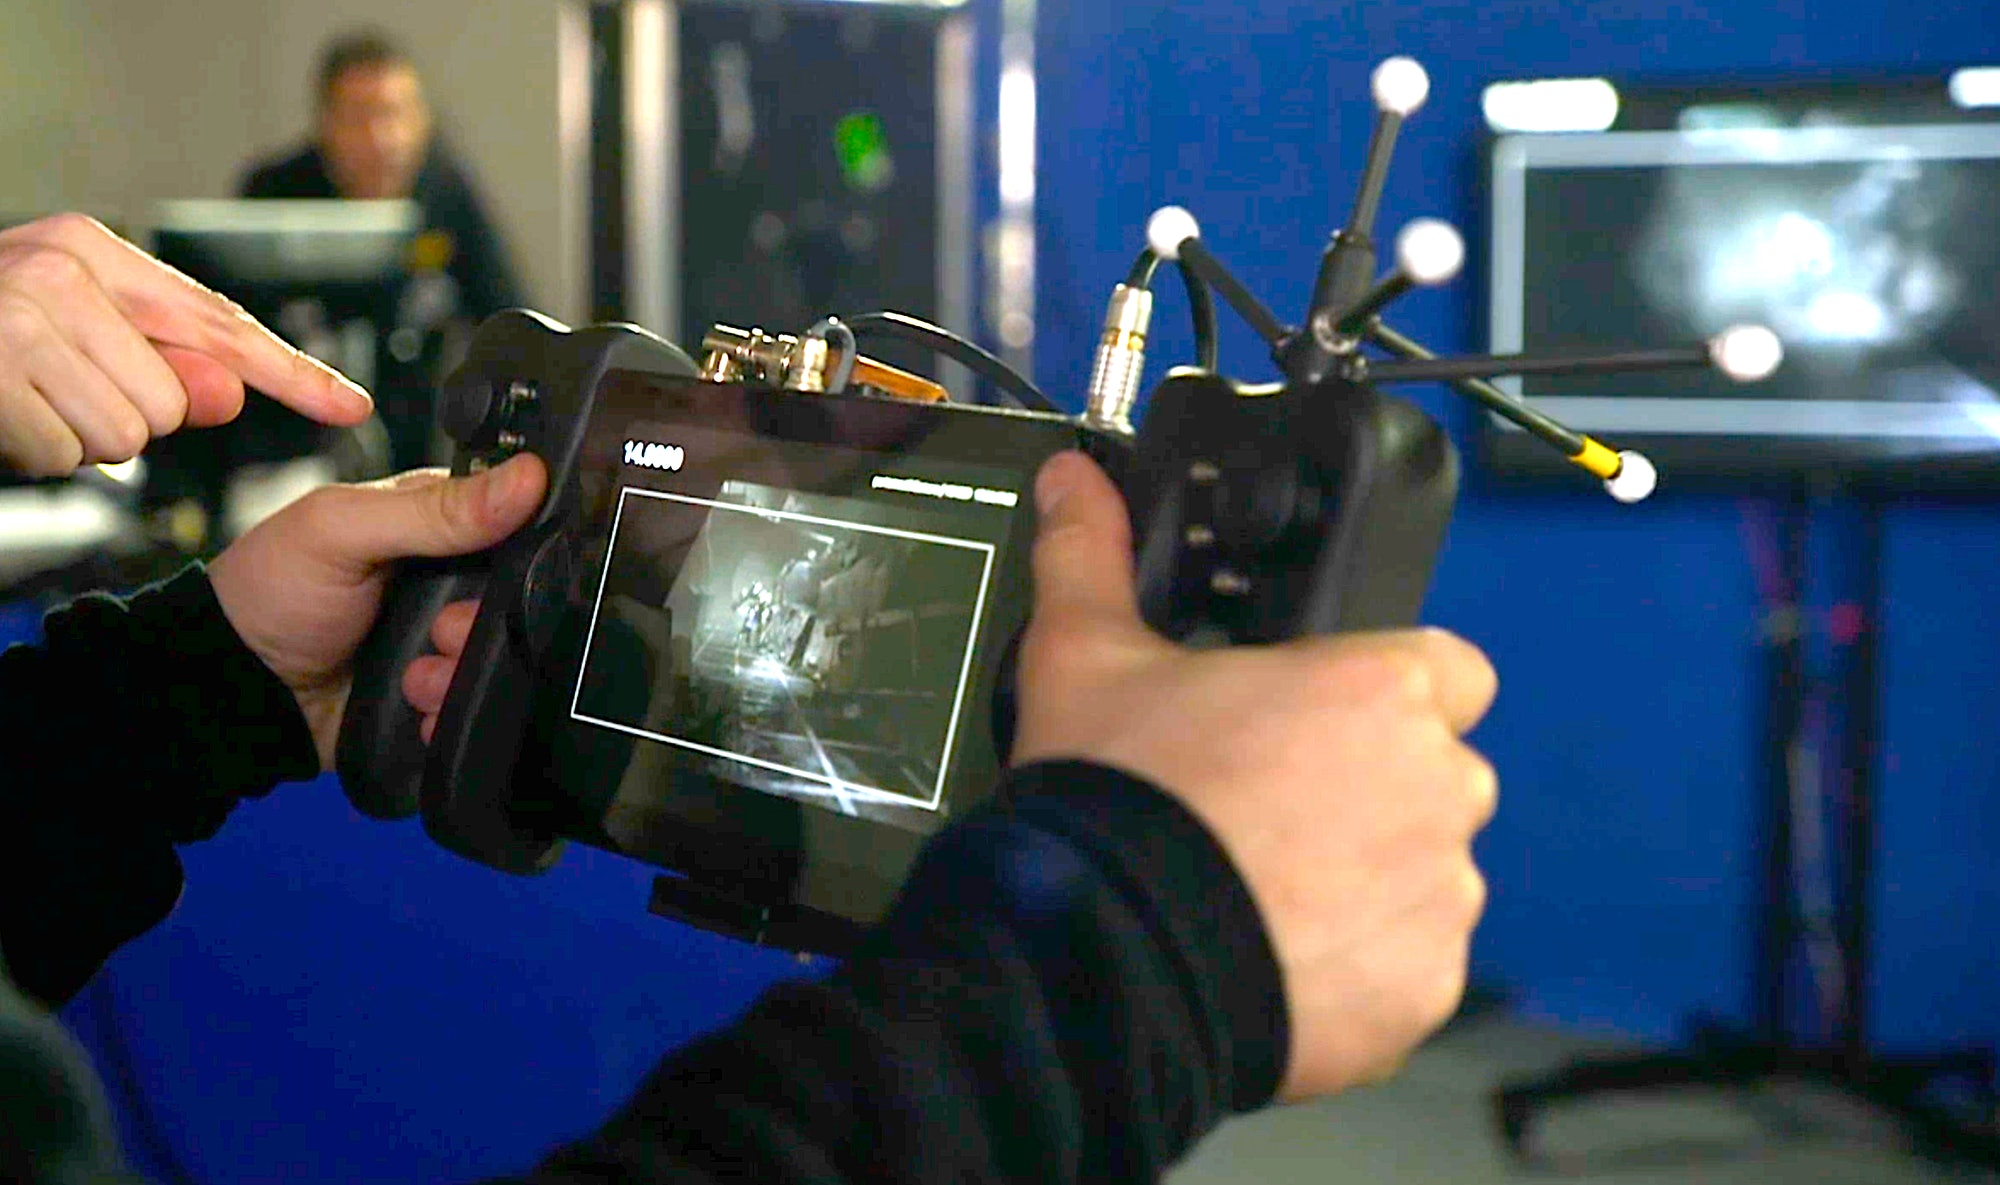 WETA Digital's Virtual Camera used for Virtual Production